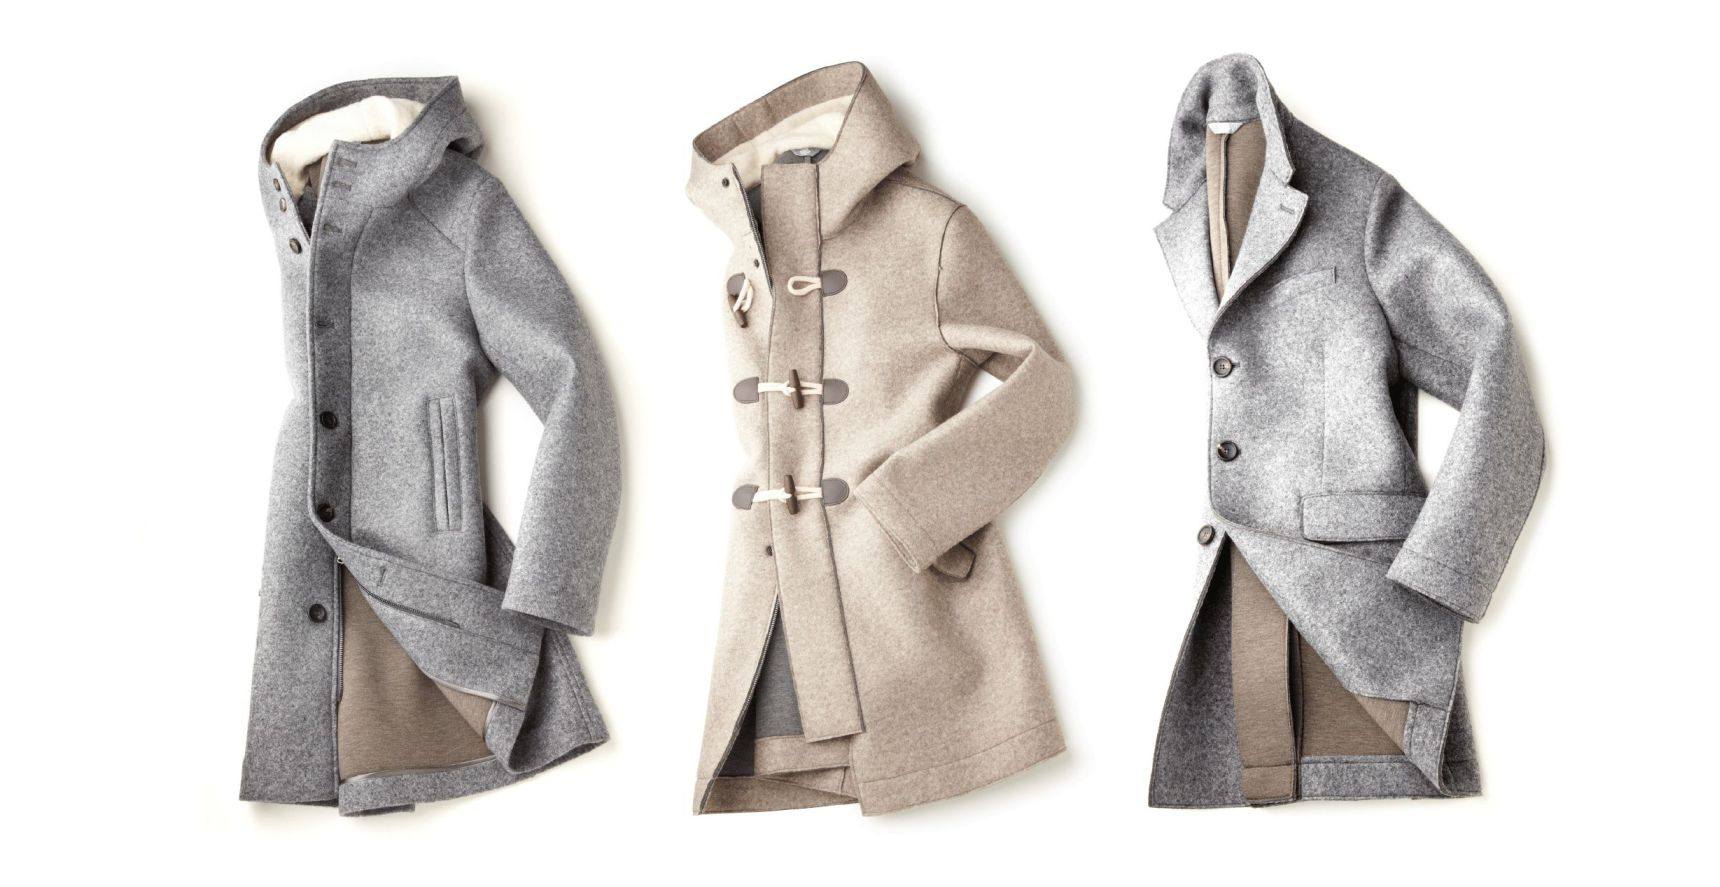 Evergreen Winter Jacket styles for men